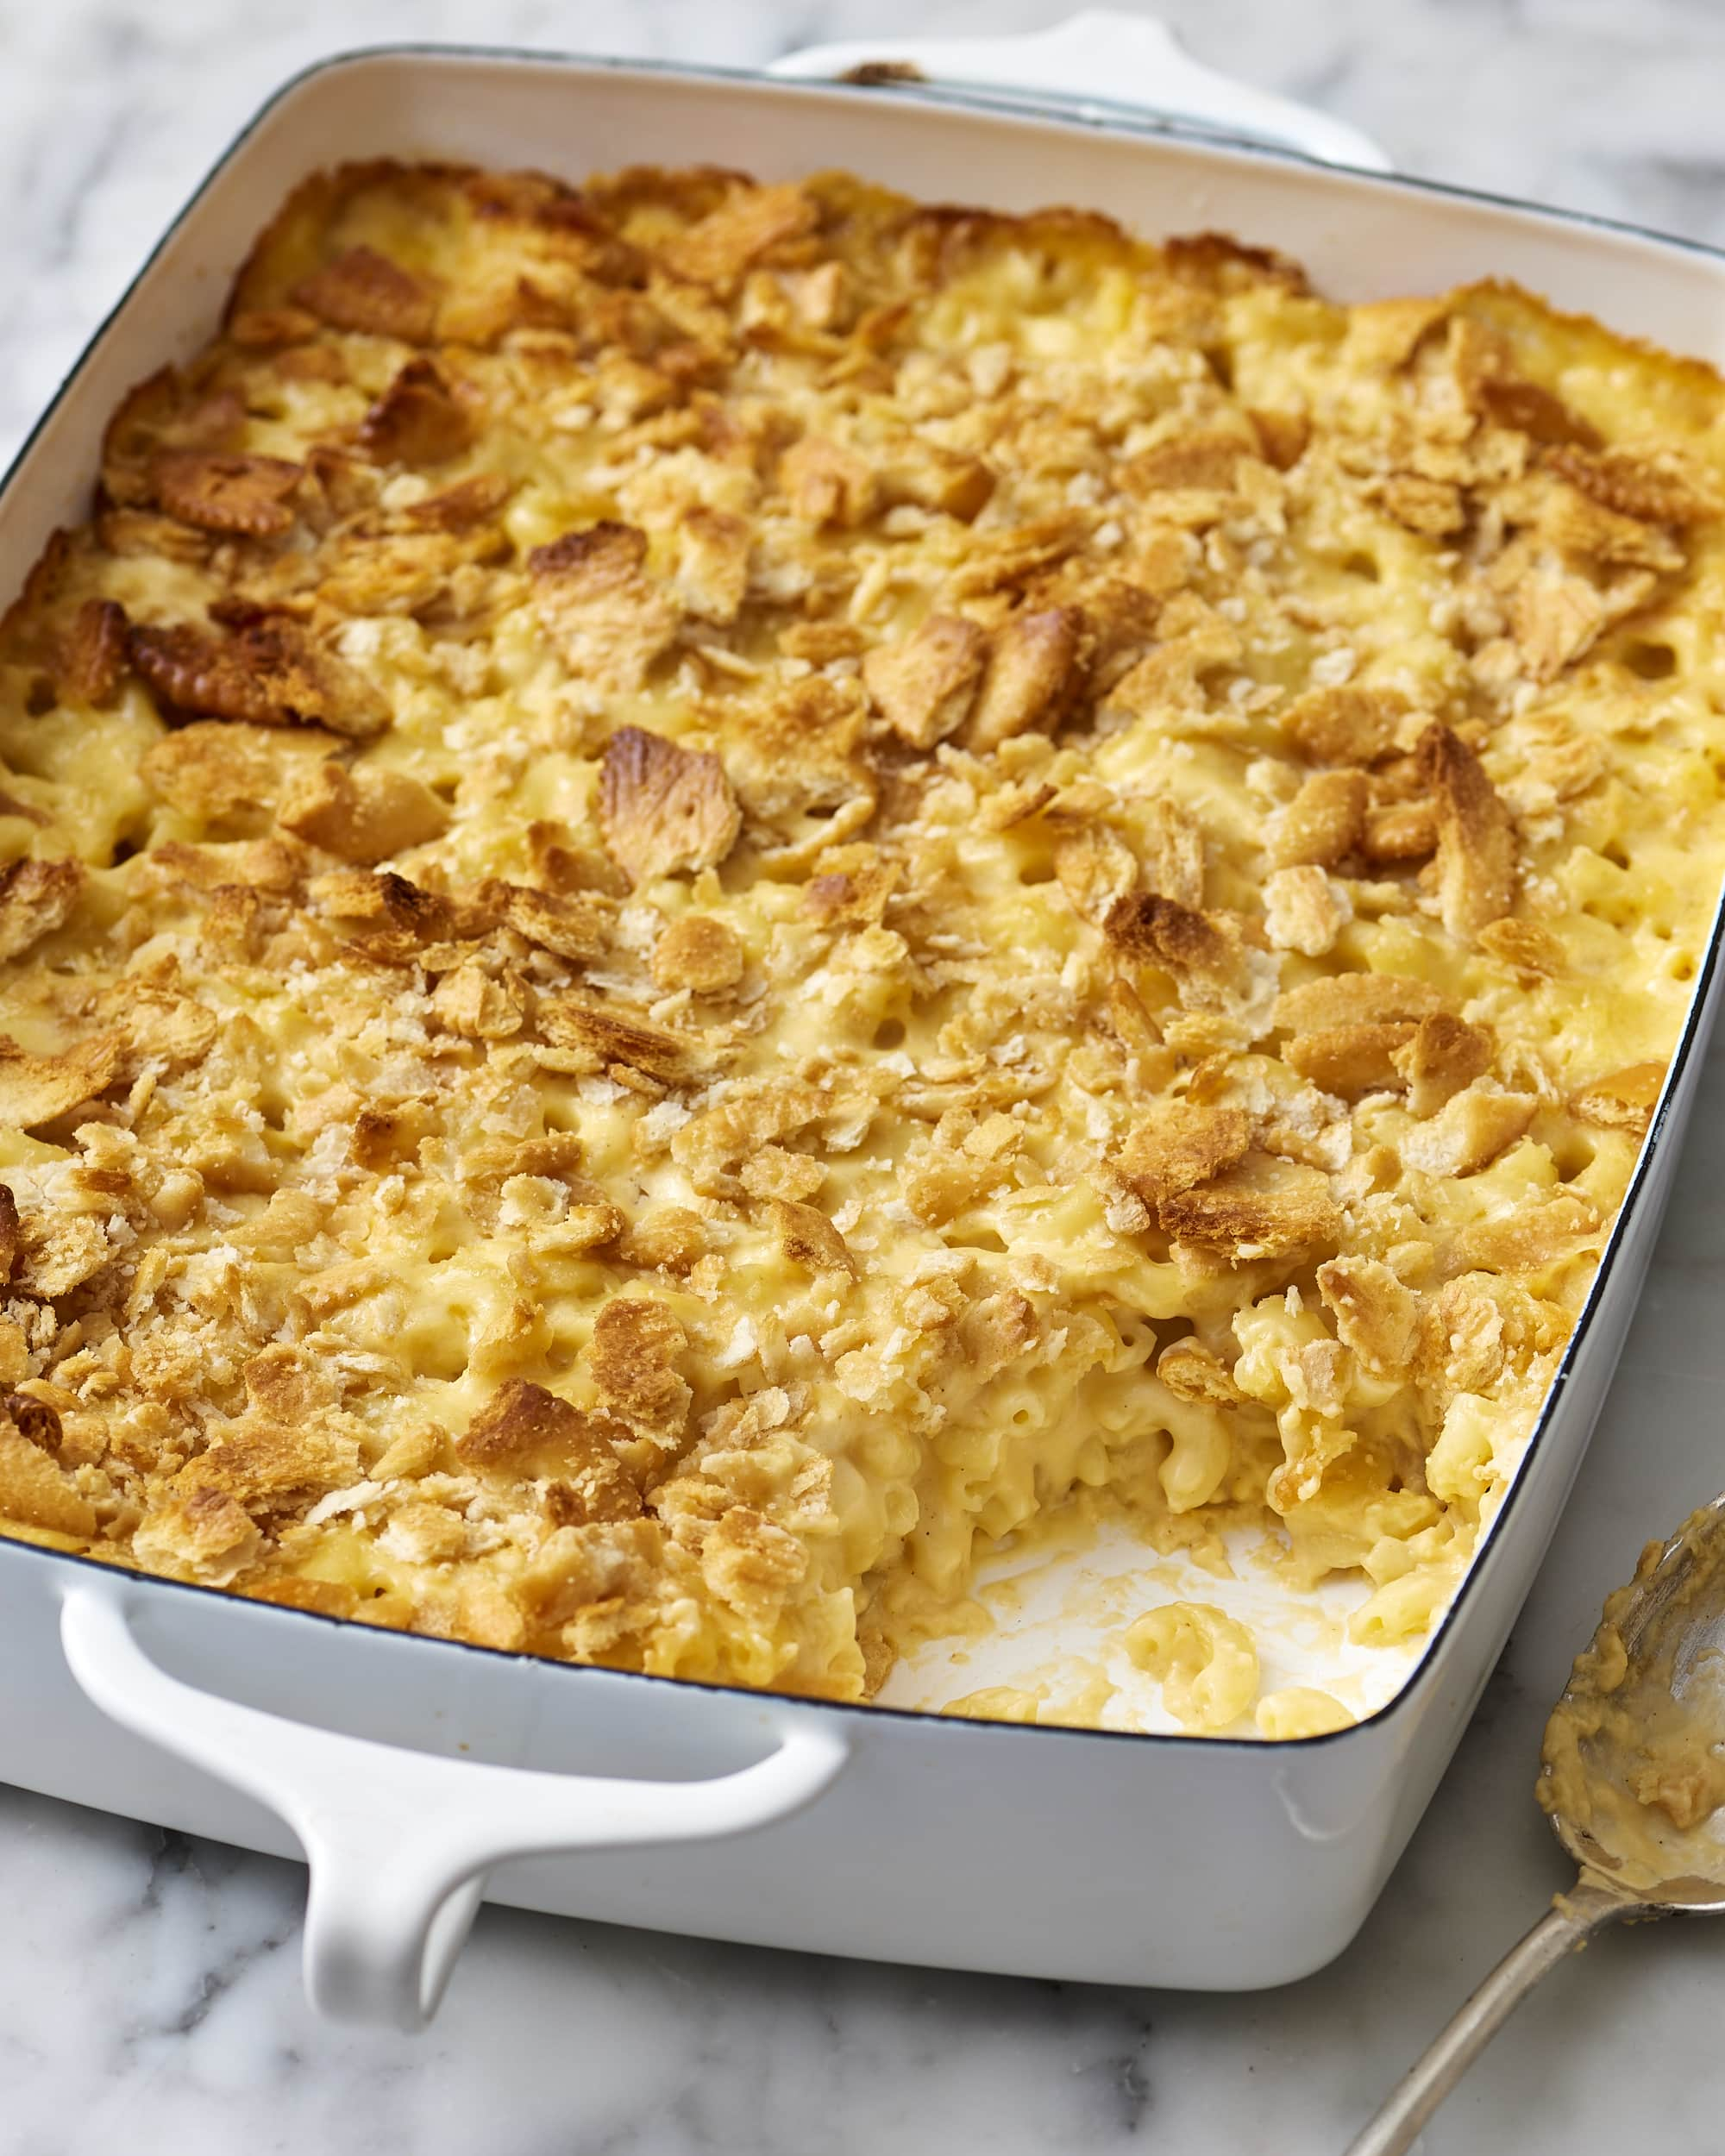 Recipe: Make-Ahead Creamy Mac & Cheese Casserole